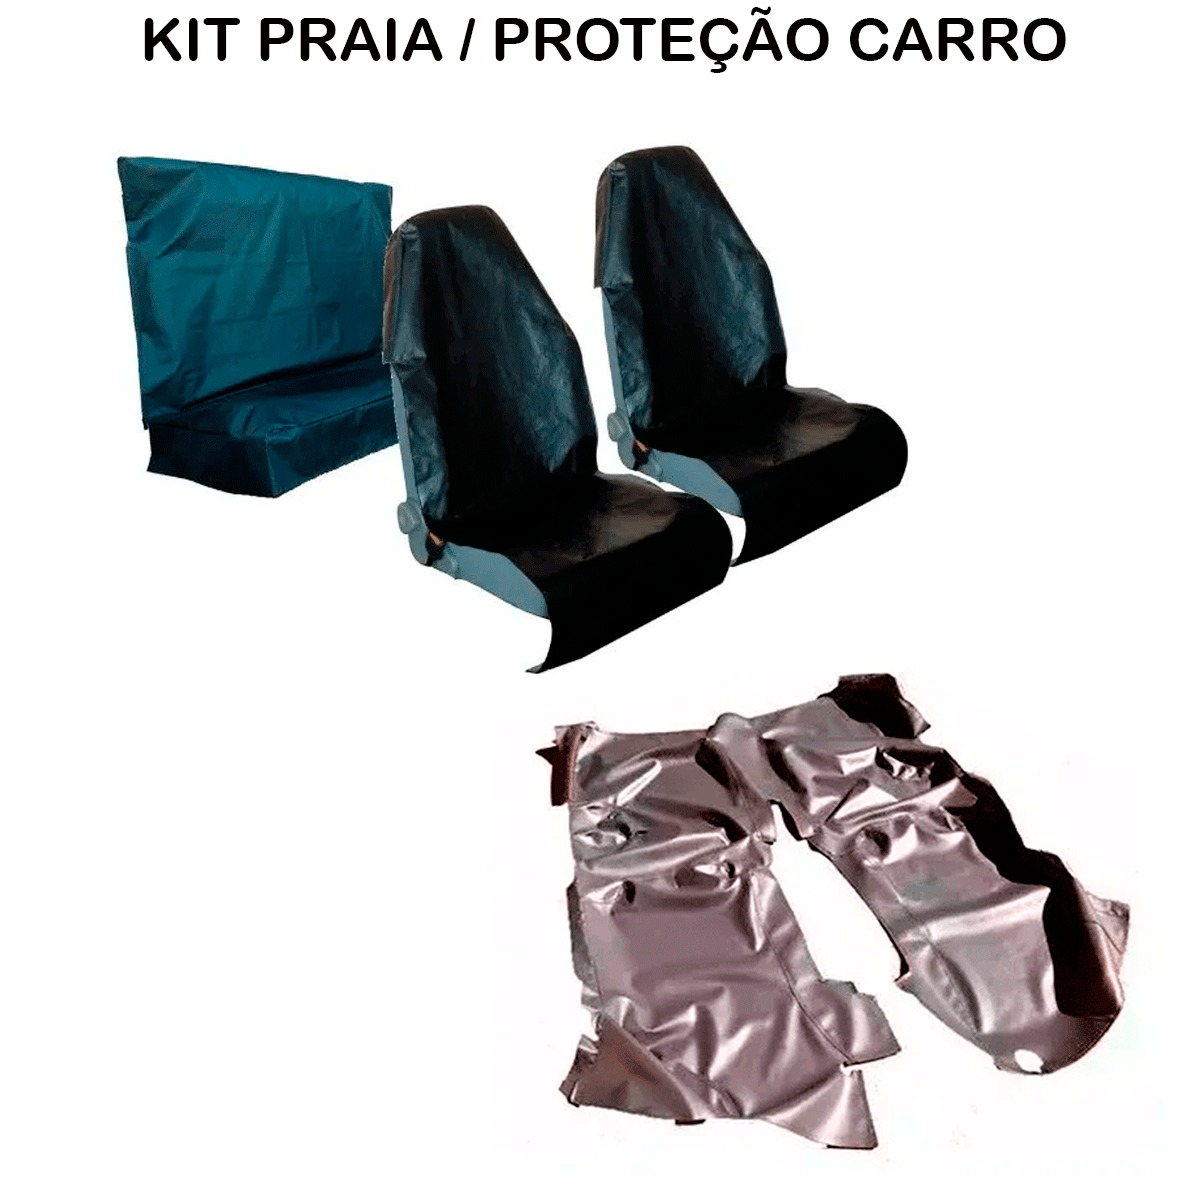 Tapete Em Vinil Fiat Siena até 2003 + Capa Banco Protecao Banco Areia Suor Academia